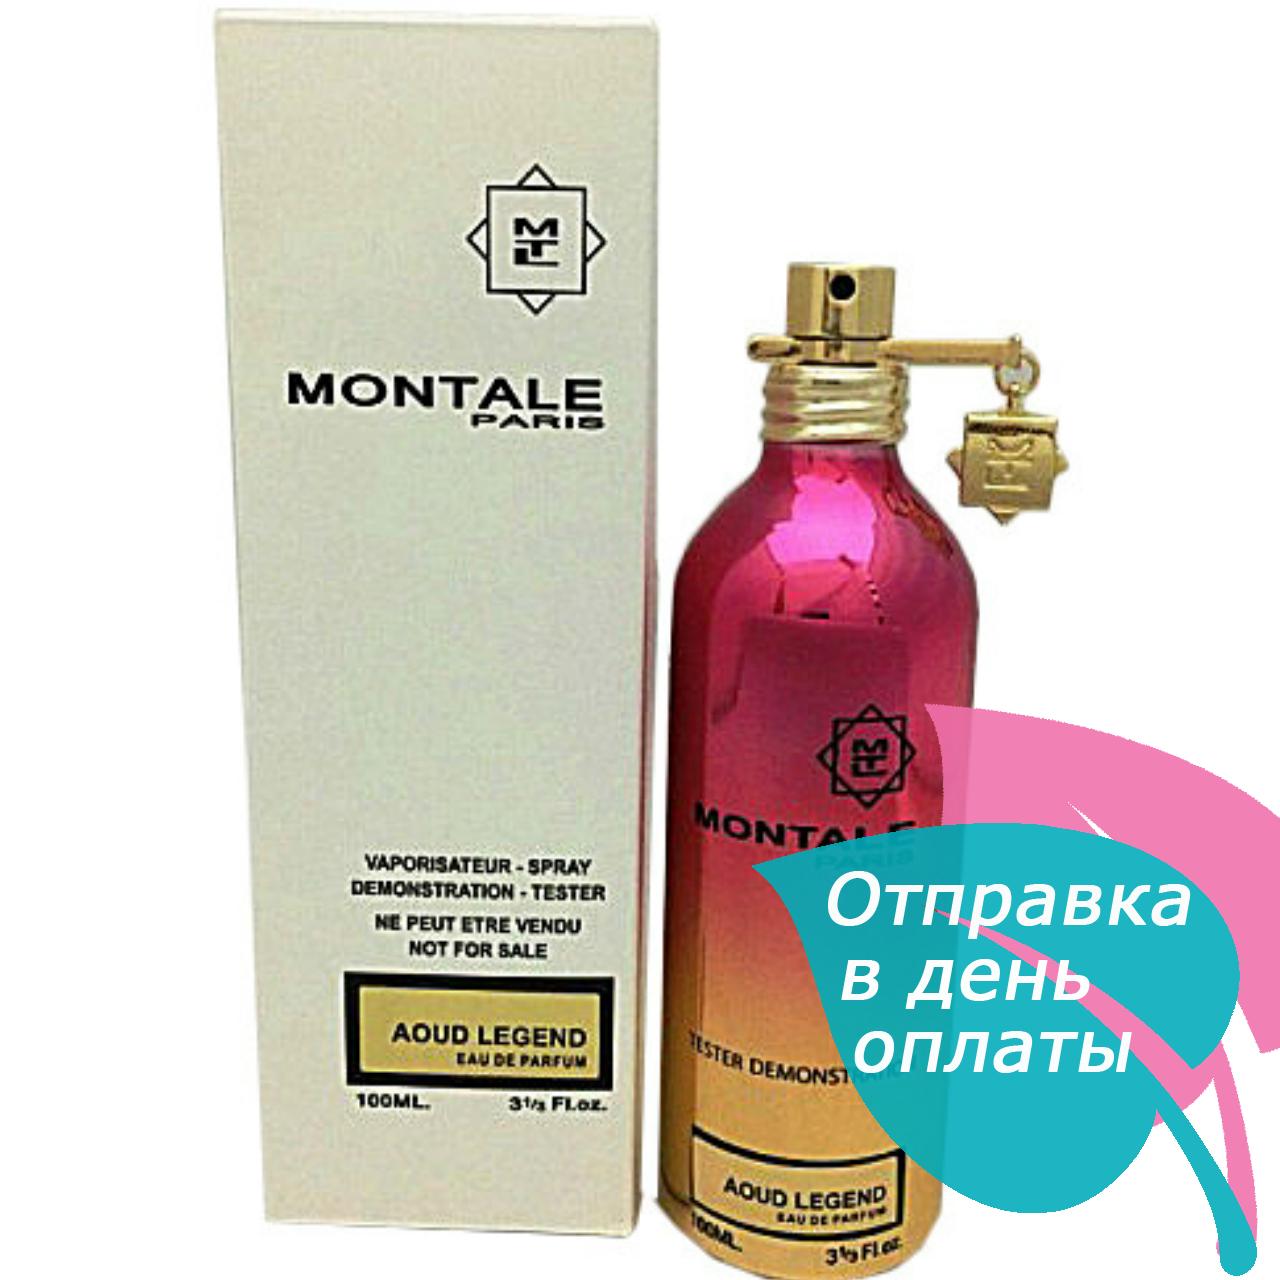 Montale Aoud Legend TESTER унисекс, 100 мл